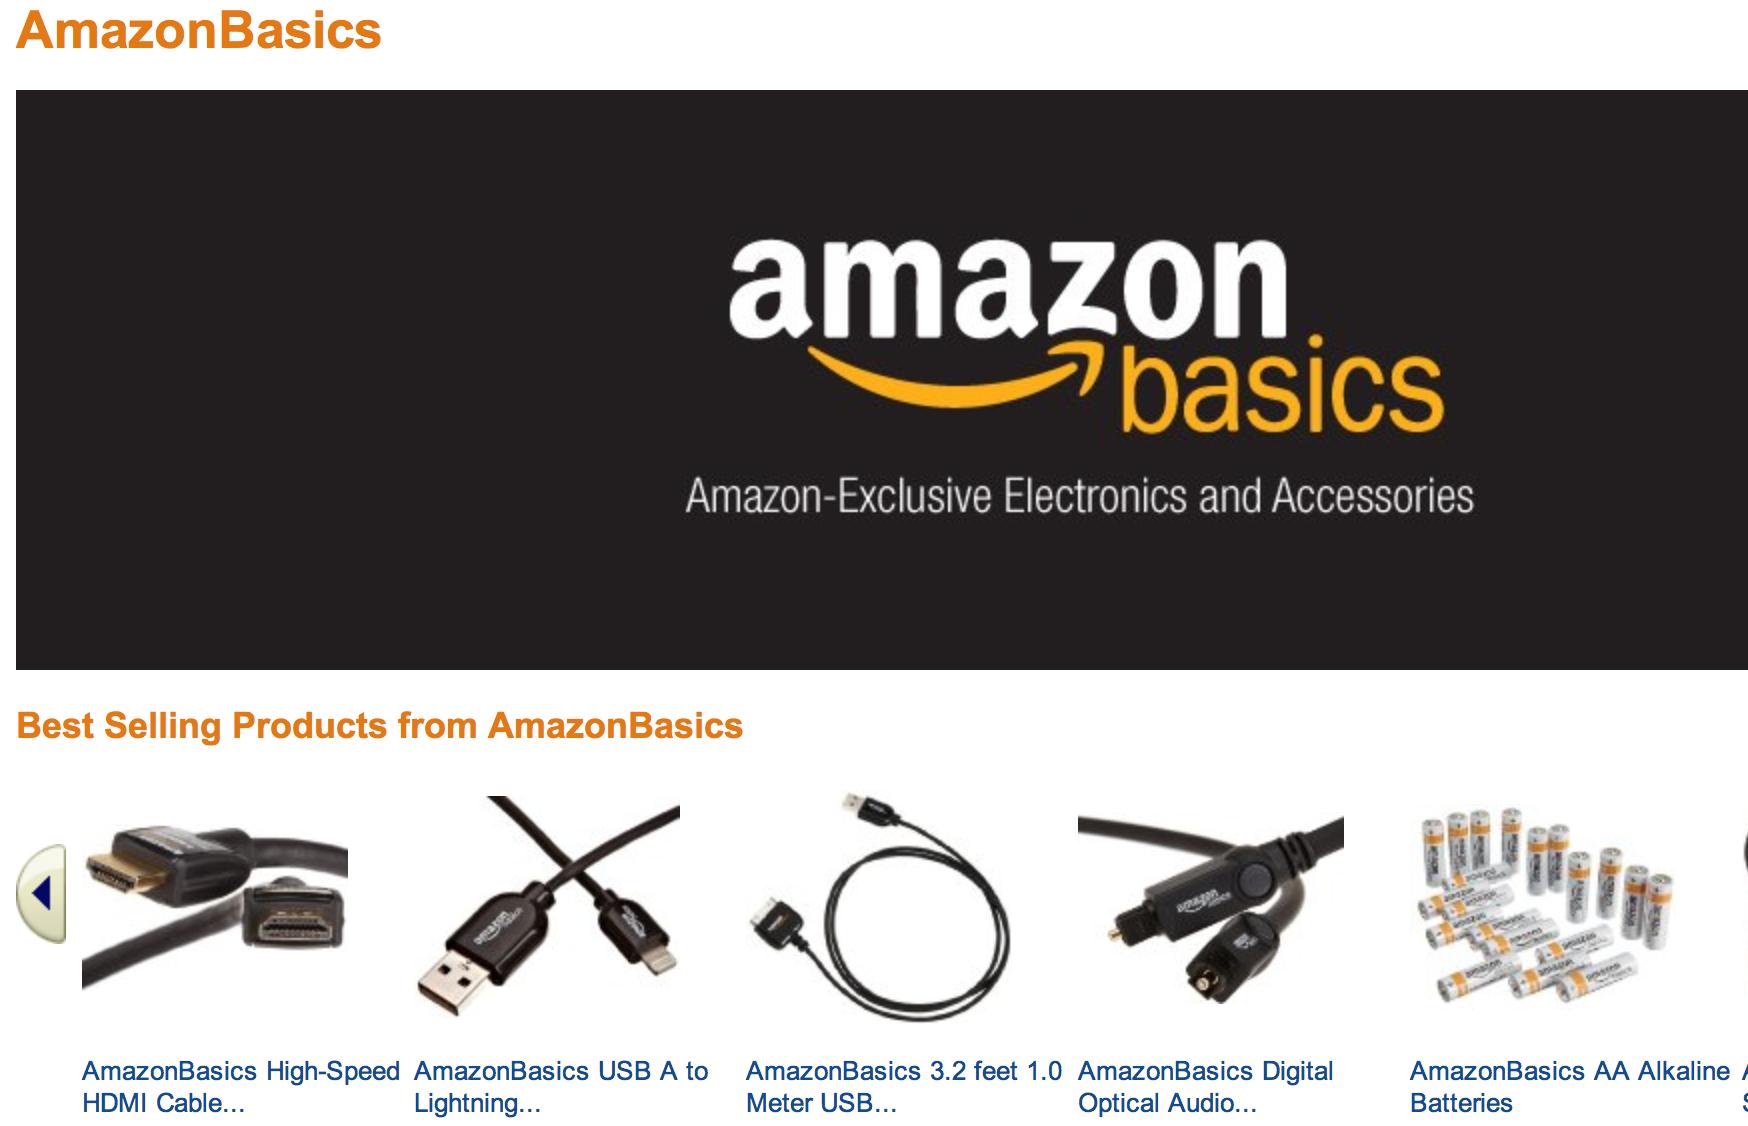 amazon basics homepage